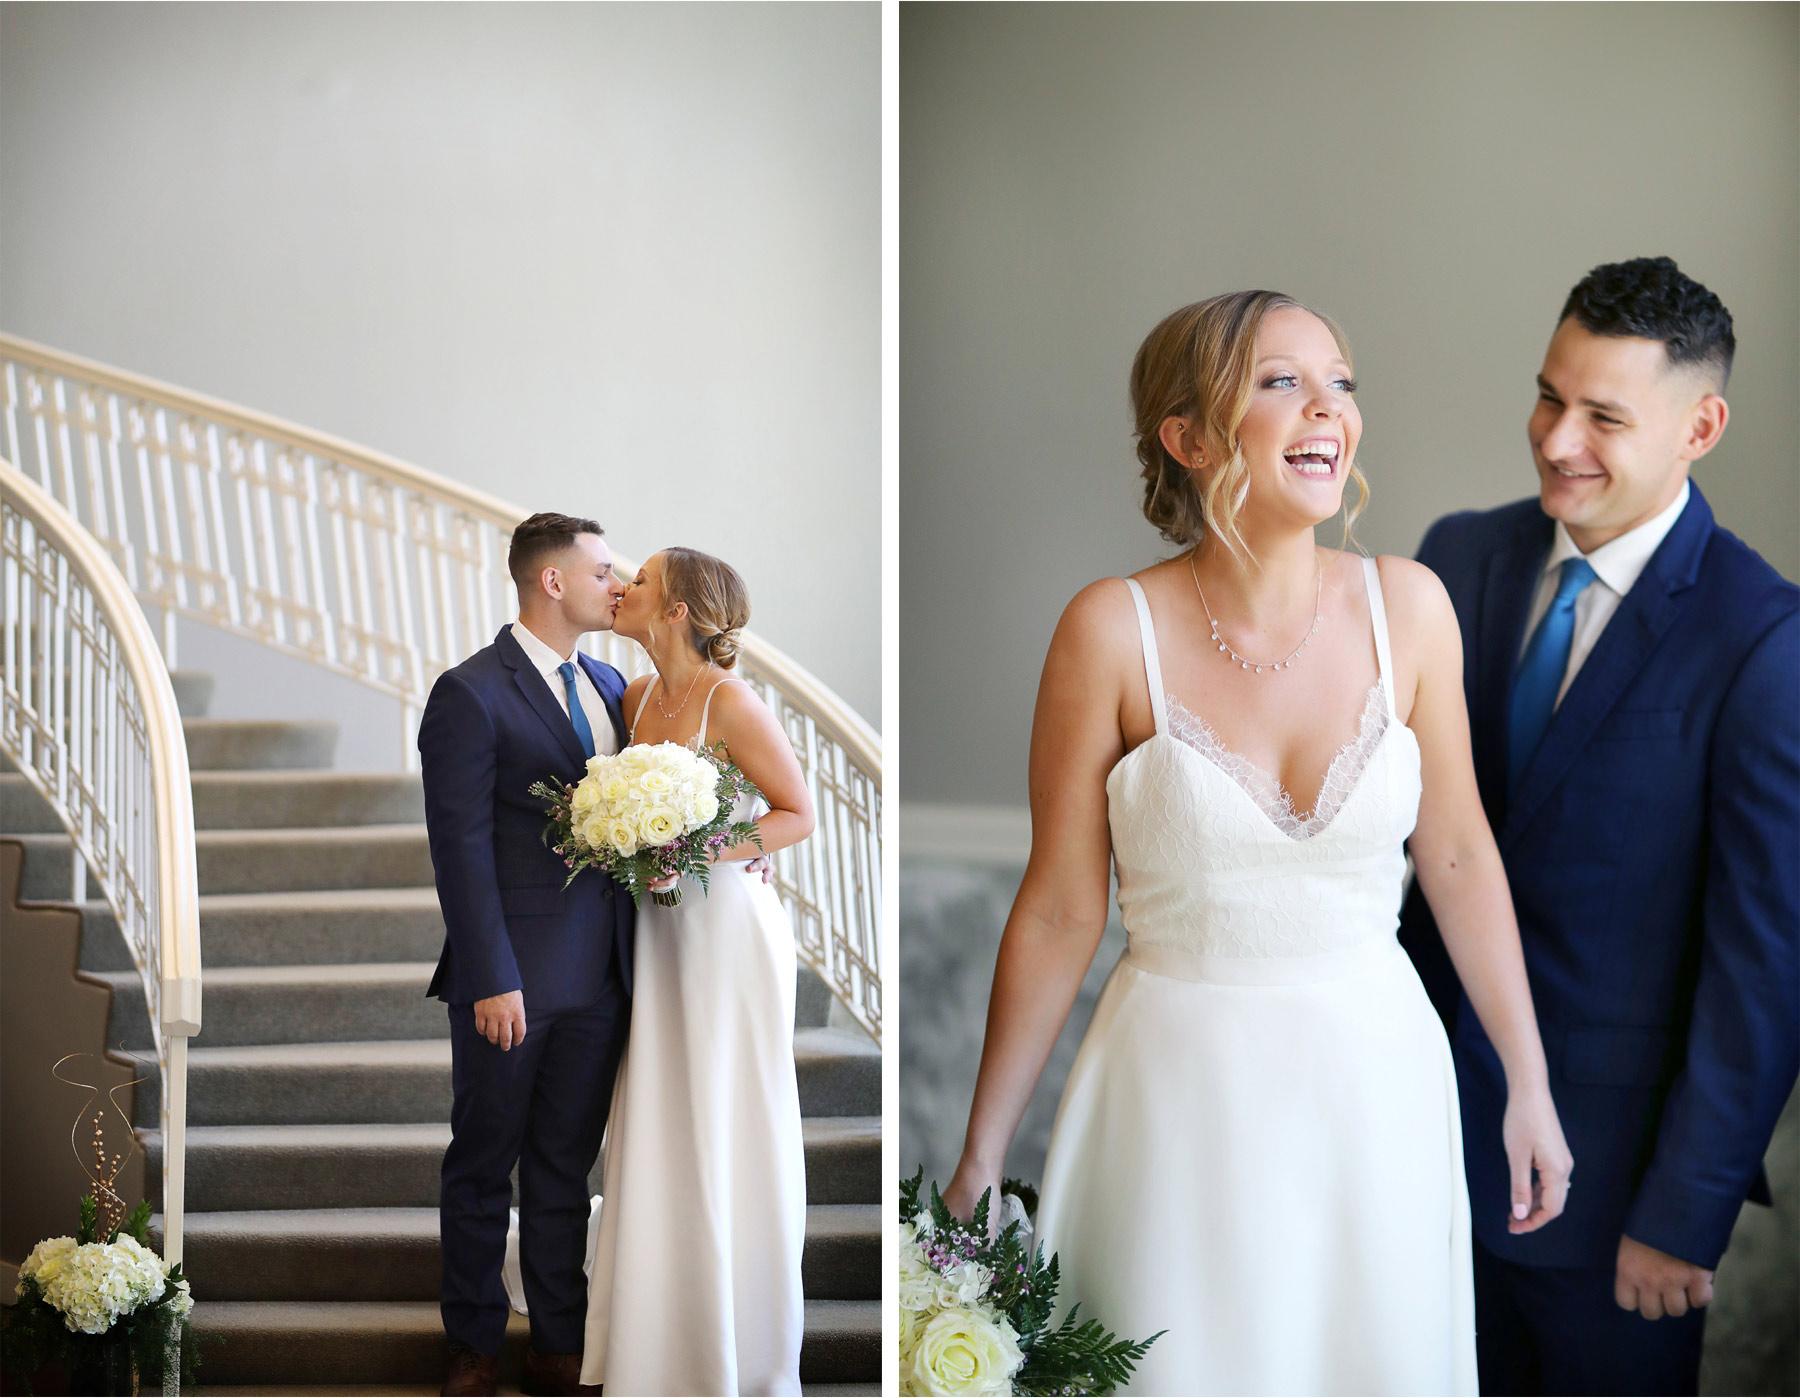 06-Minneapolis-Minnesota-Wedding-Andrew-Vick-Photography-Calhoun-Beach-Club-Bride-Groom-First-Look-Staircase-Samantha-and-Ryan.jpg